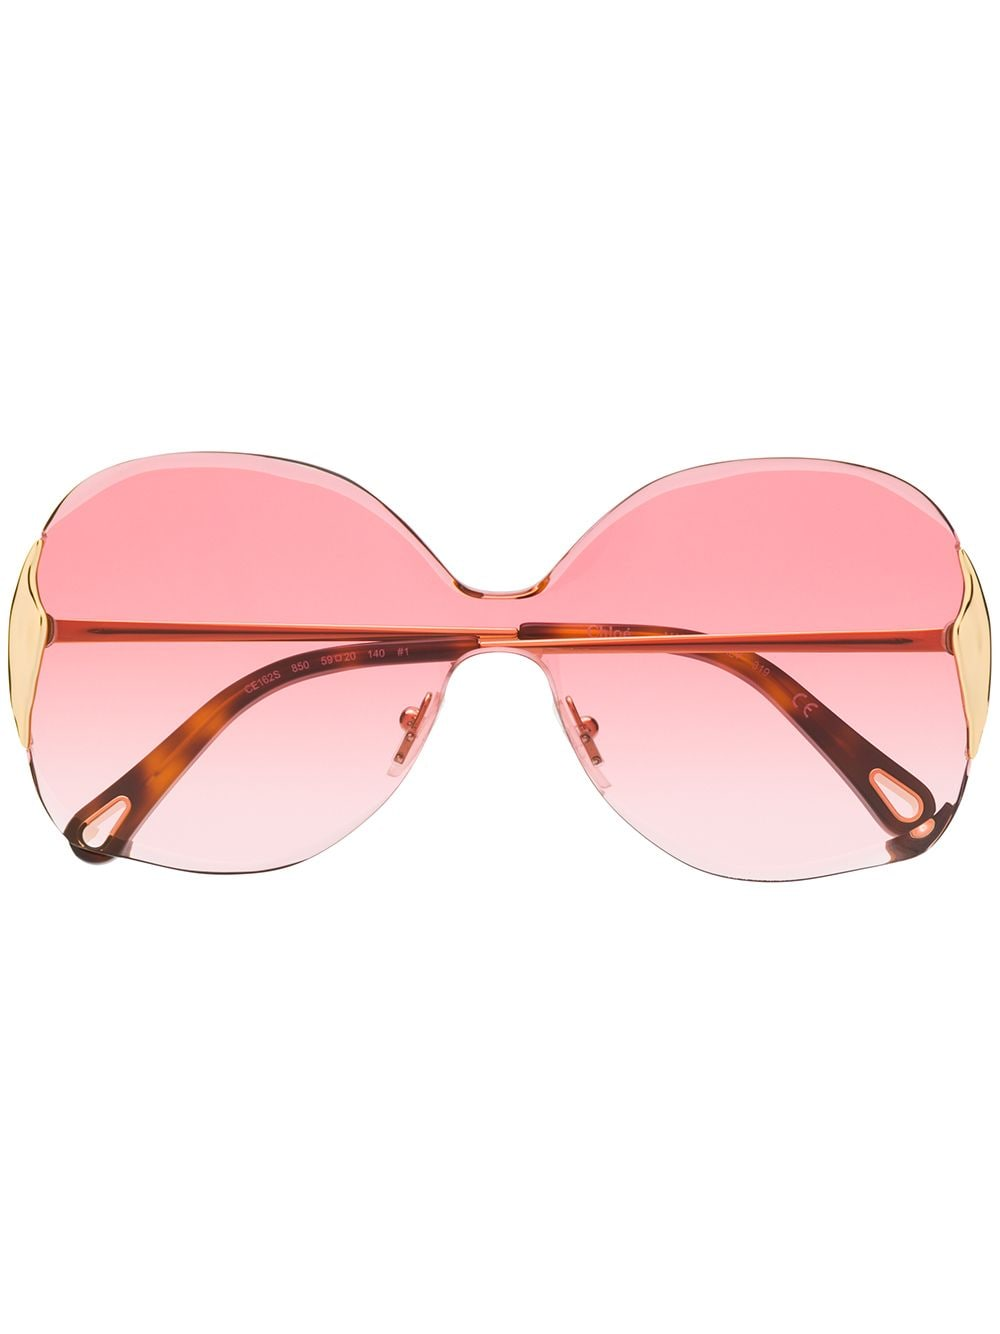 Chloé 'Curtis' Oversized-Sonnenbrille - Braun